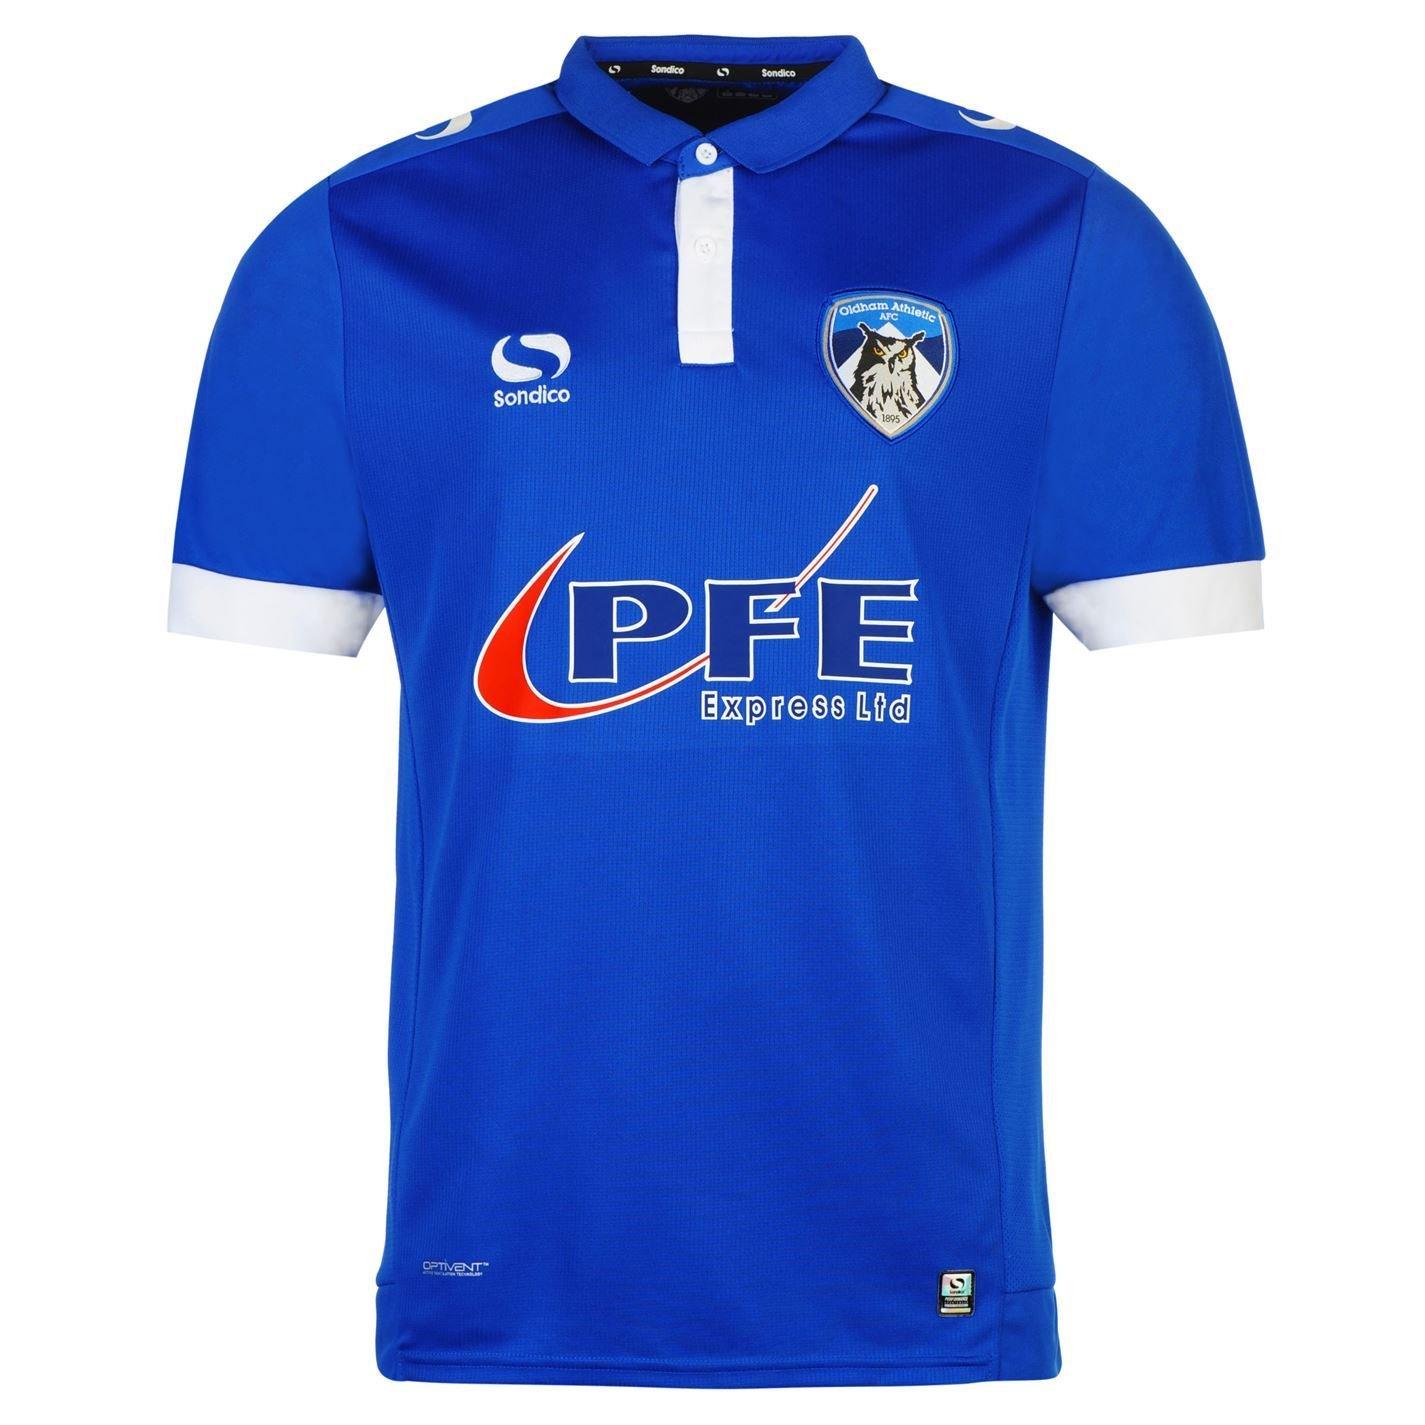 Sondico Old FC Home Jersey 2016 2017メンズブルーサッカーシャツ B01M0IBWDMMedium